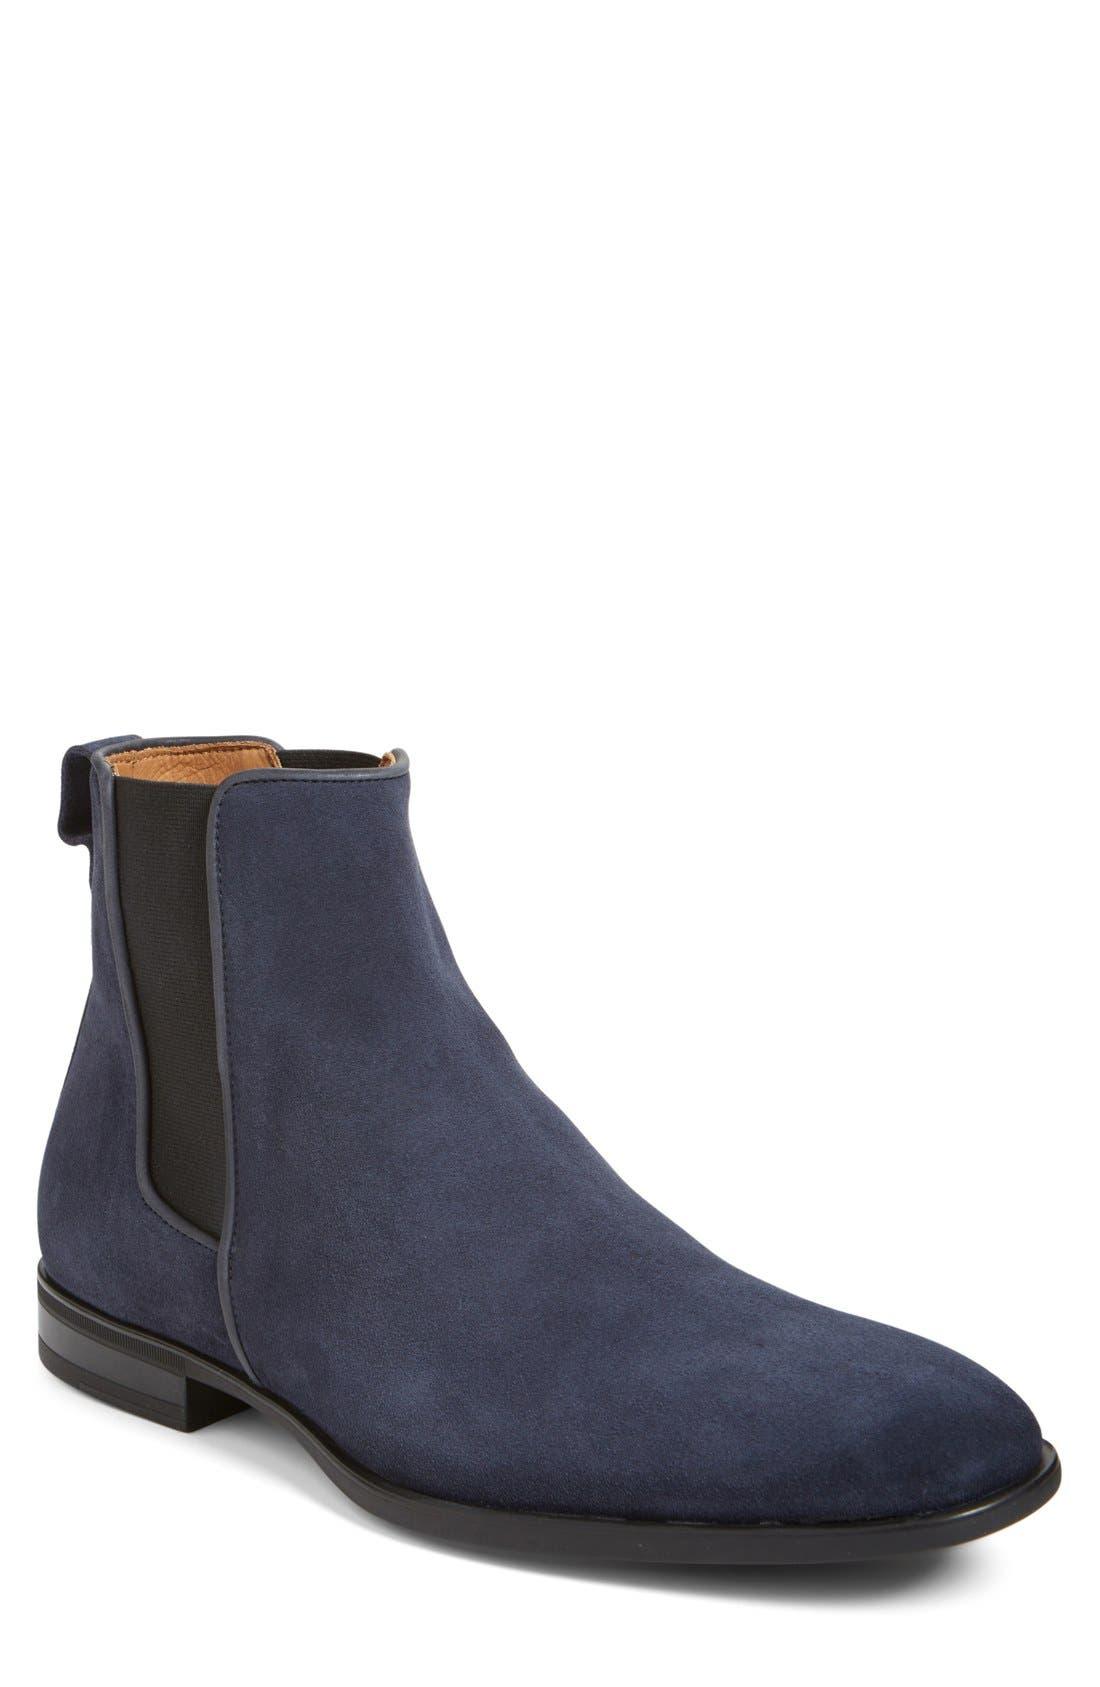 Main Image - Aquatalia'Adrian' Weatherproof Chelsea Boot (Men)